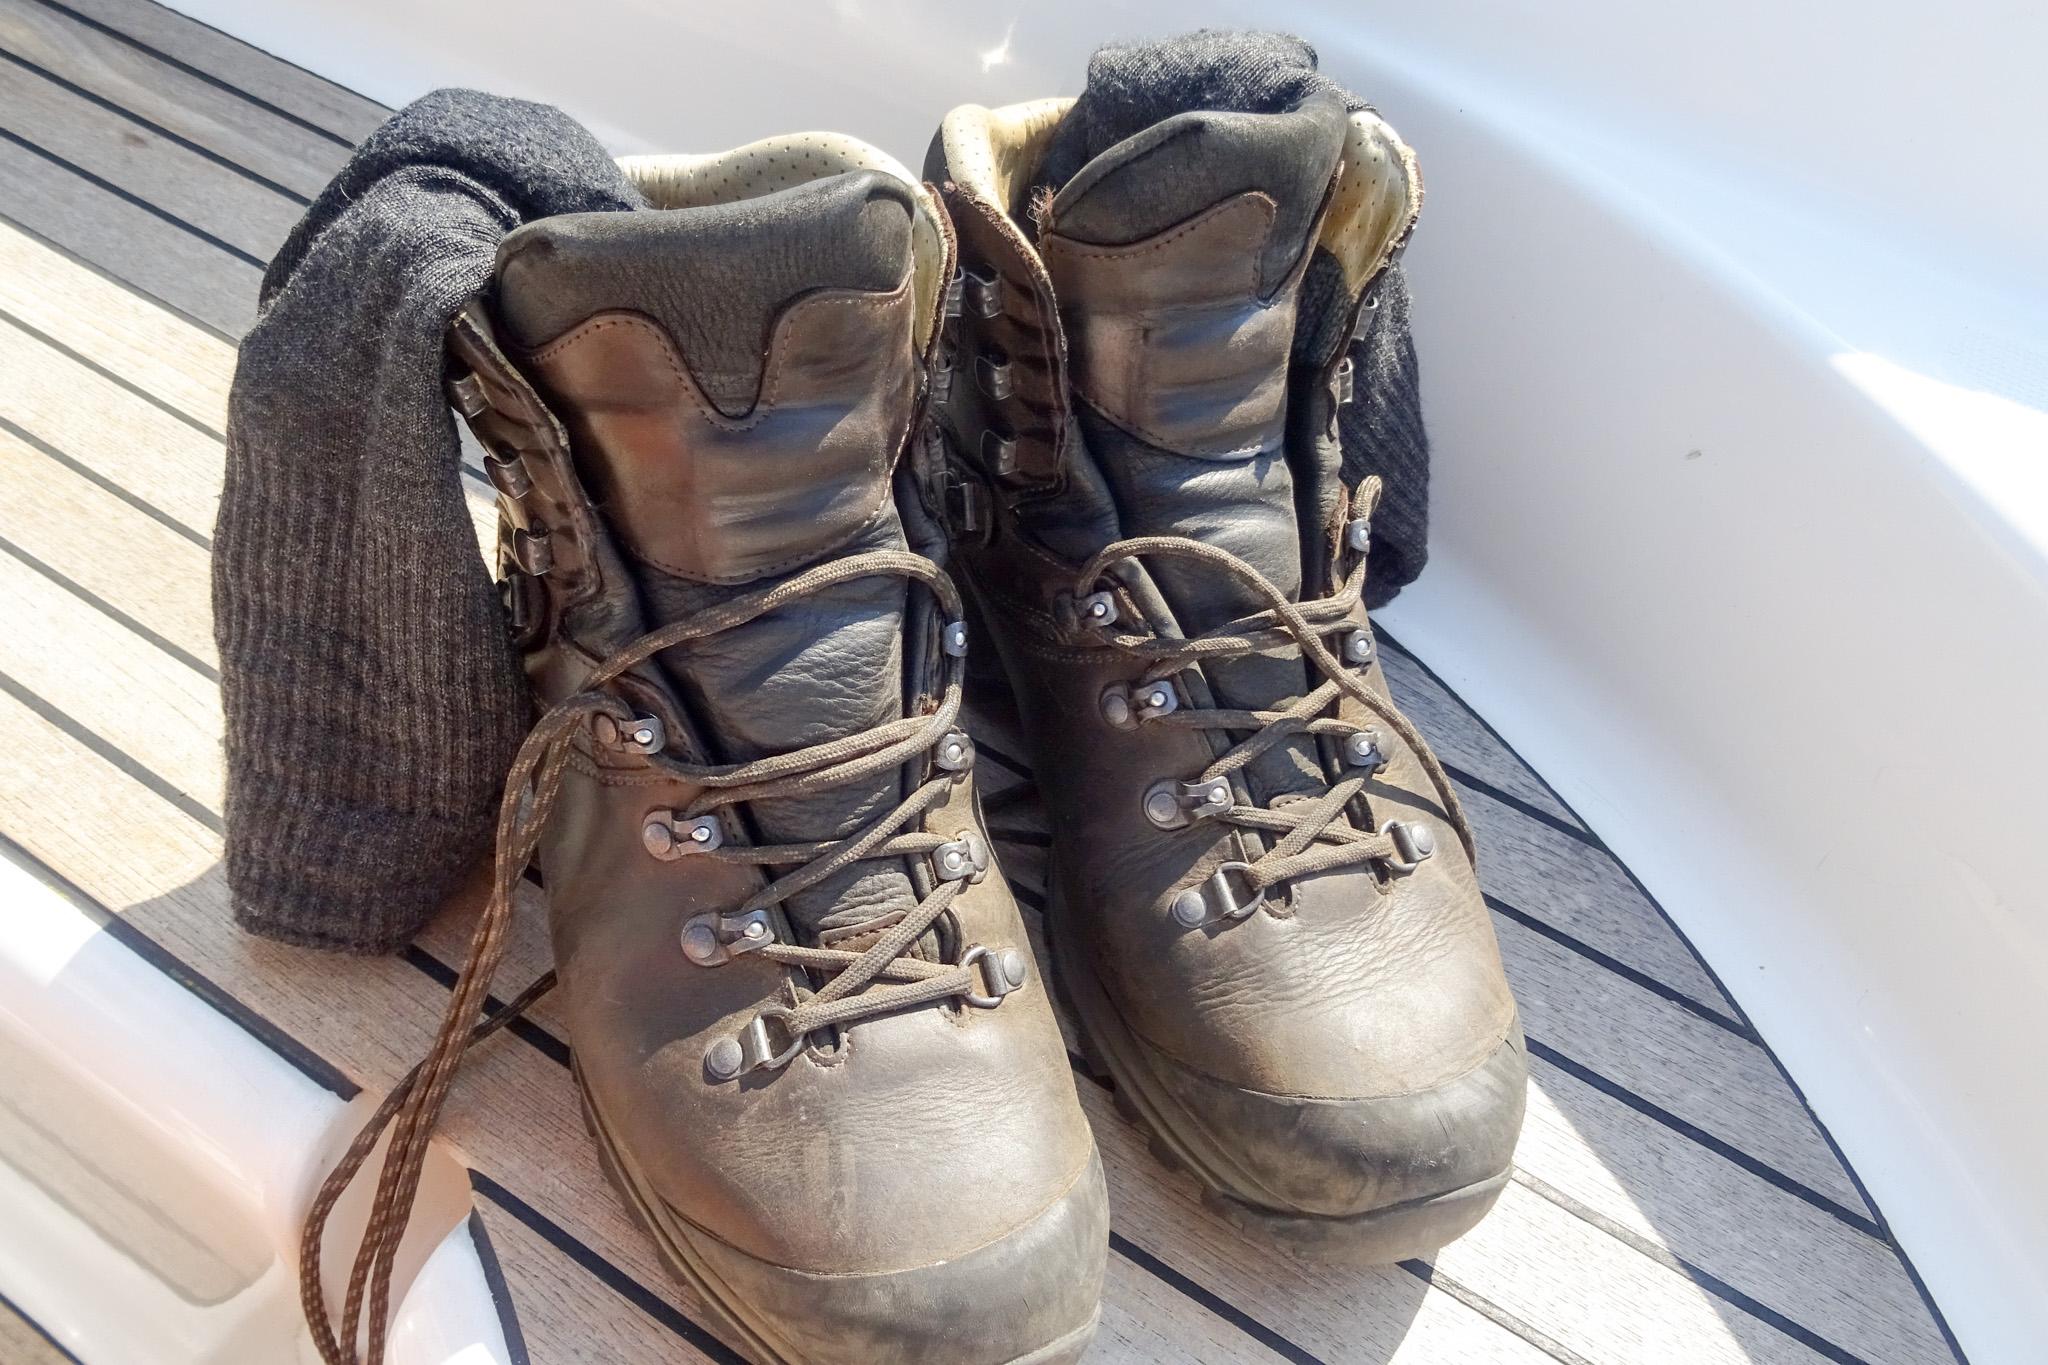 Heute: Wandern bis die Socken qualmen